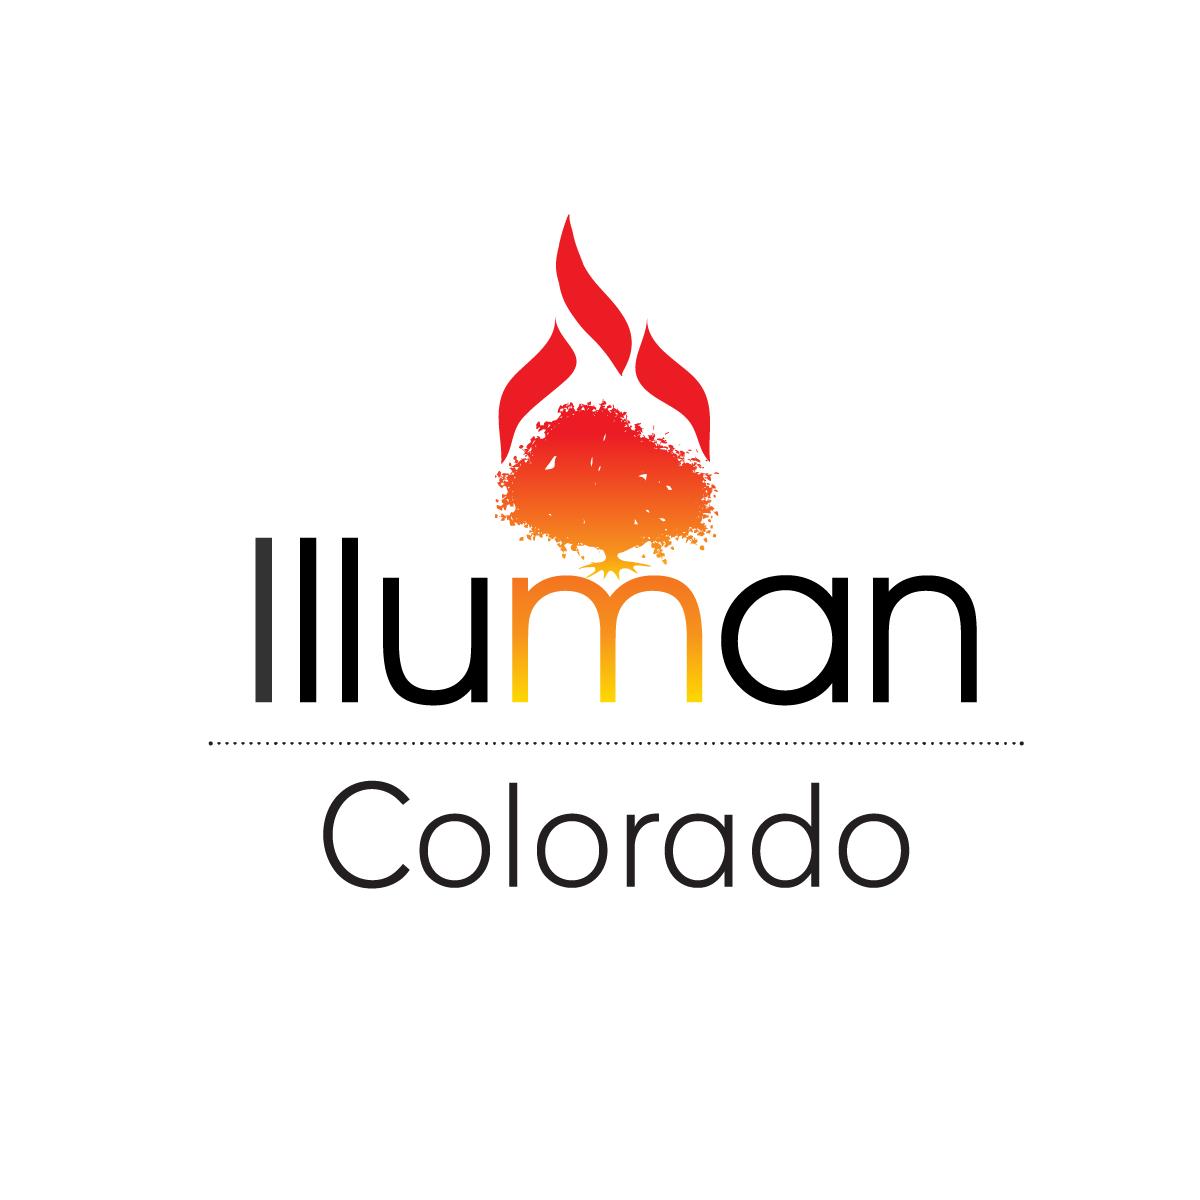 Illuman Colorado